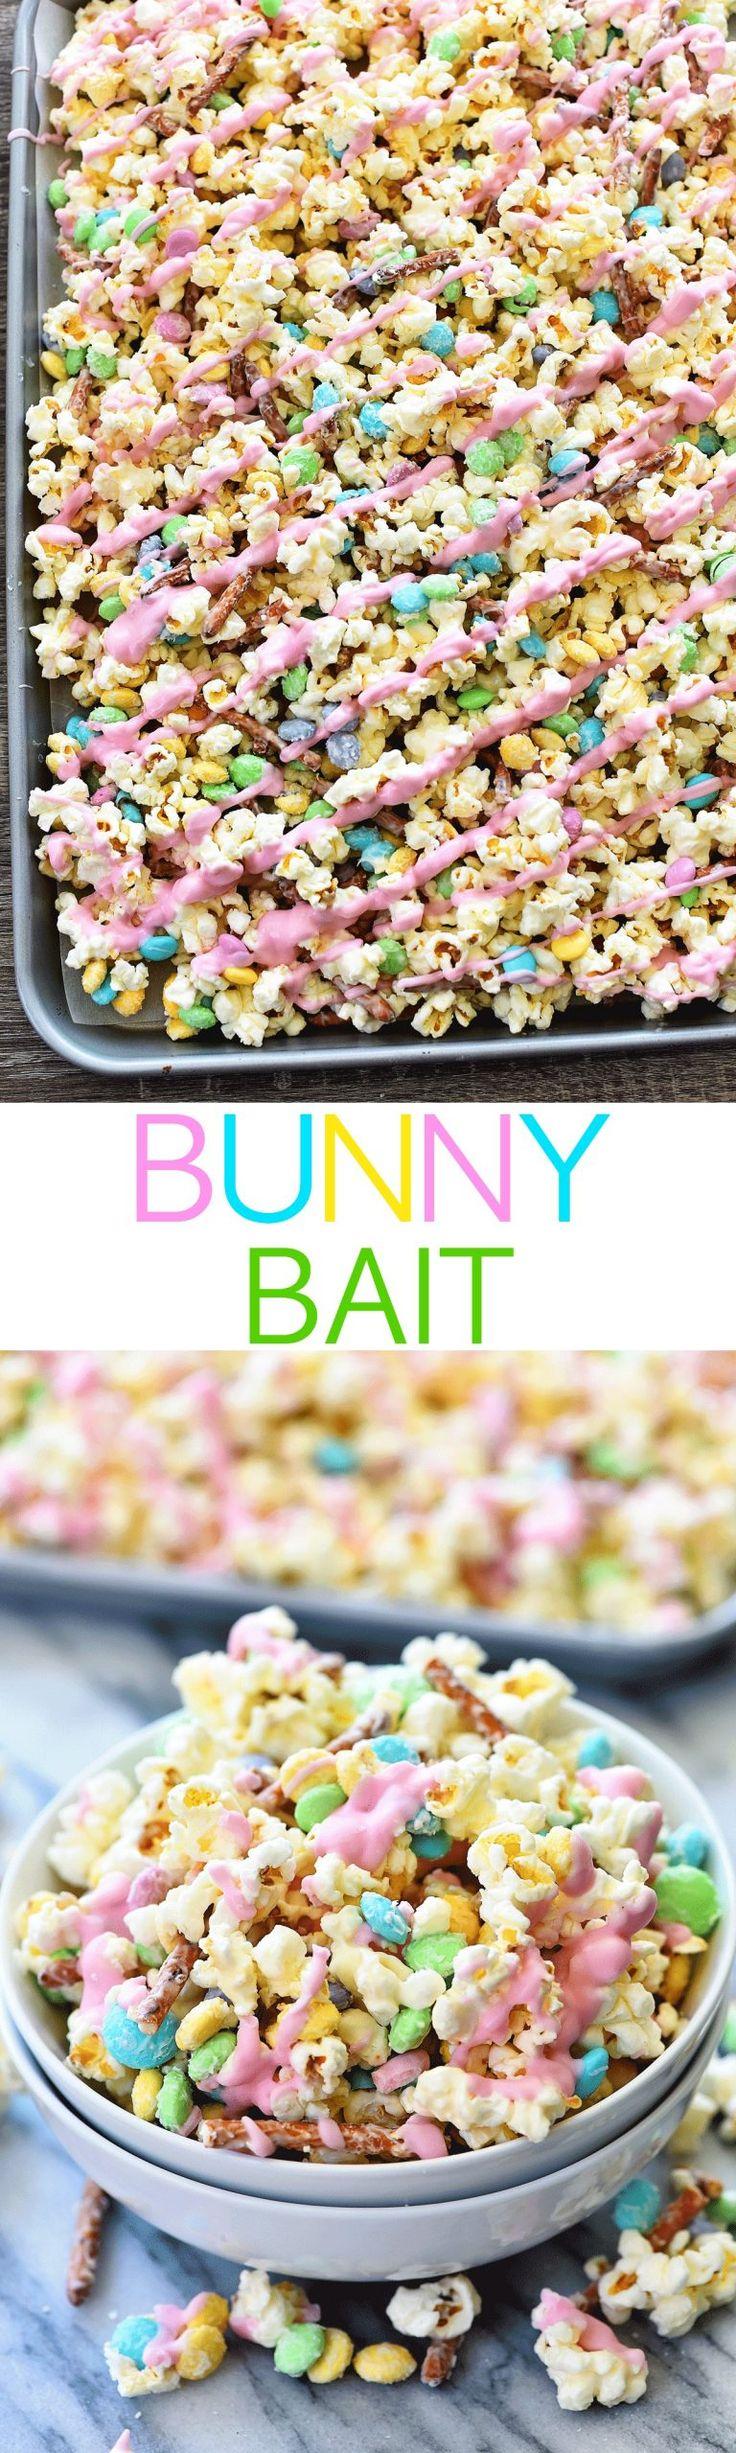 Bunny Bait - Life In The Lofthouse